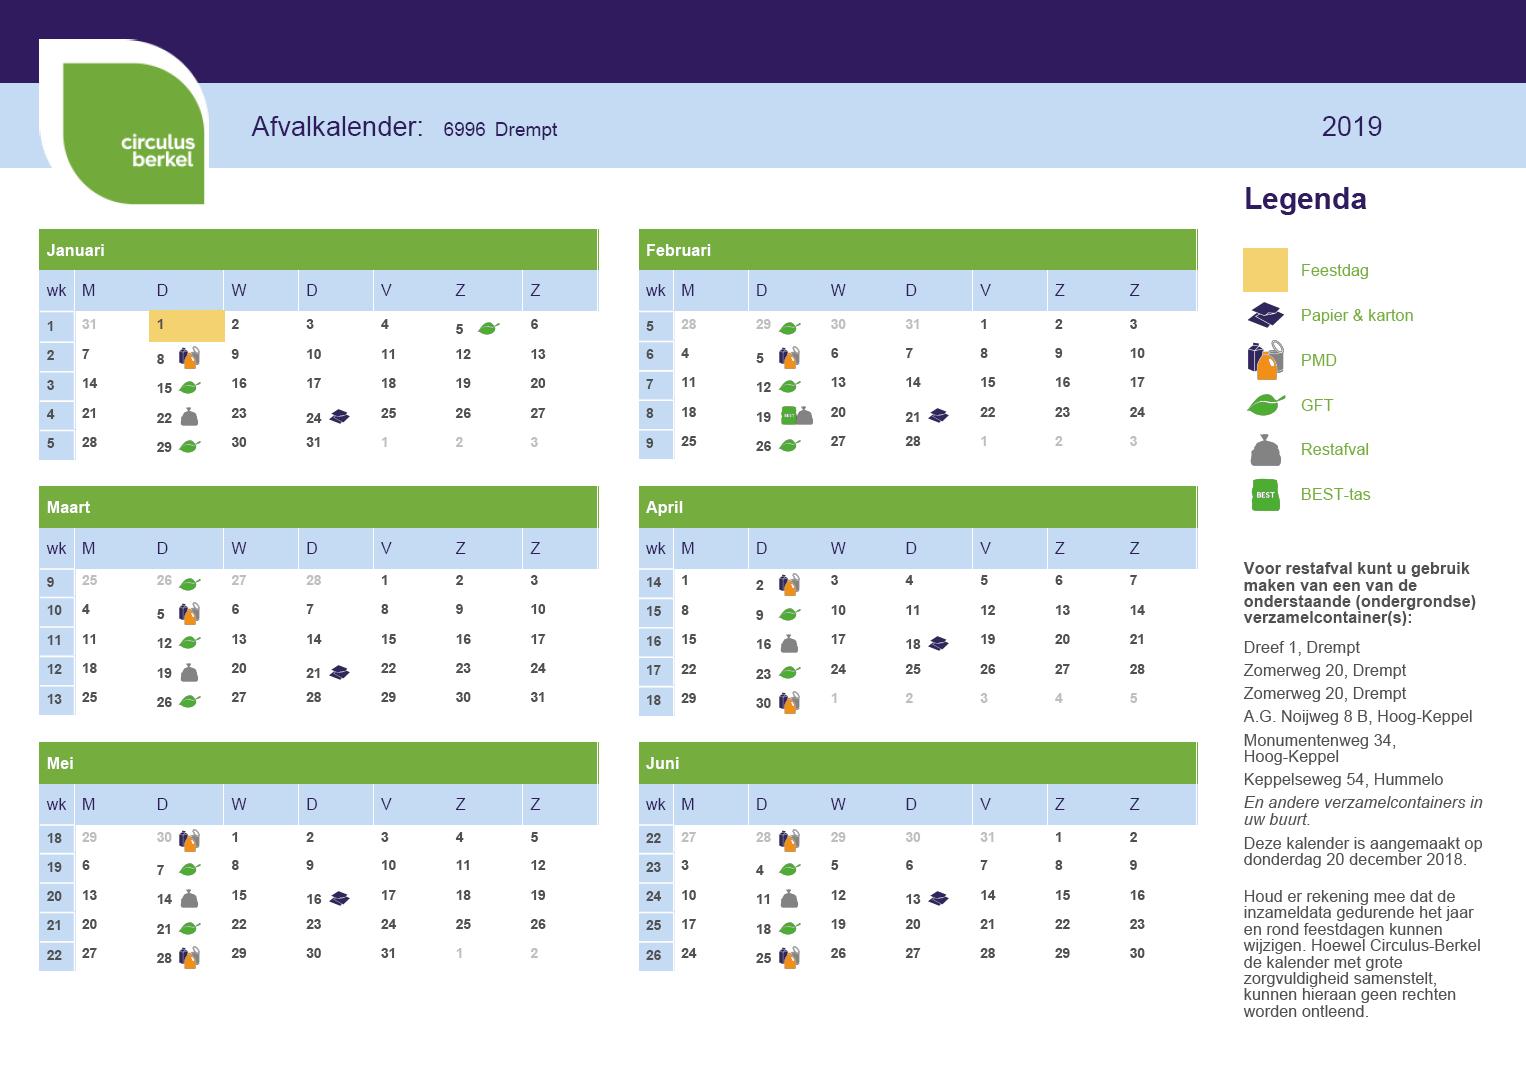 Afvalkalender 6996 Drempt, januari tot en met juni 2019